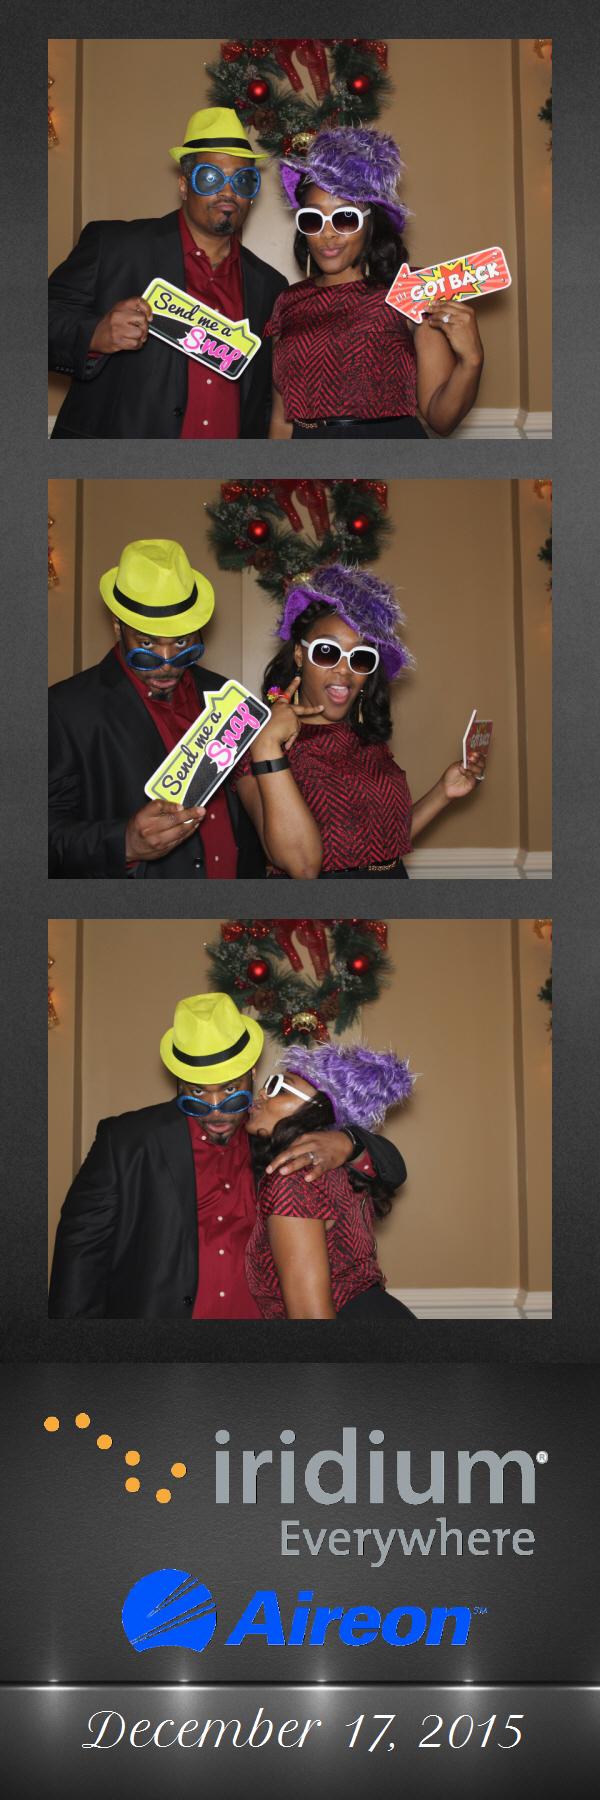 Guest House Events Photo Booth Iridium (16).jpg